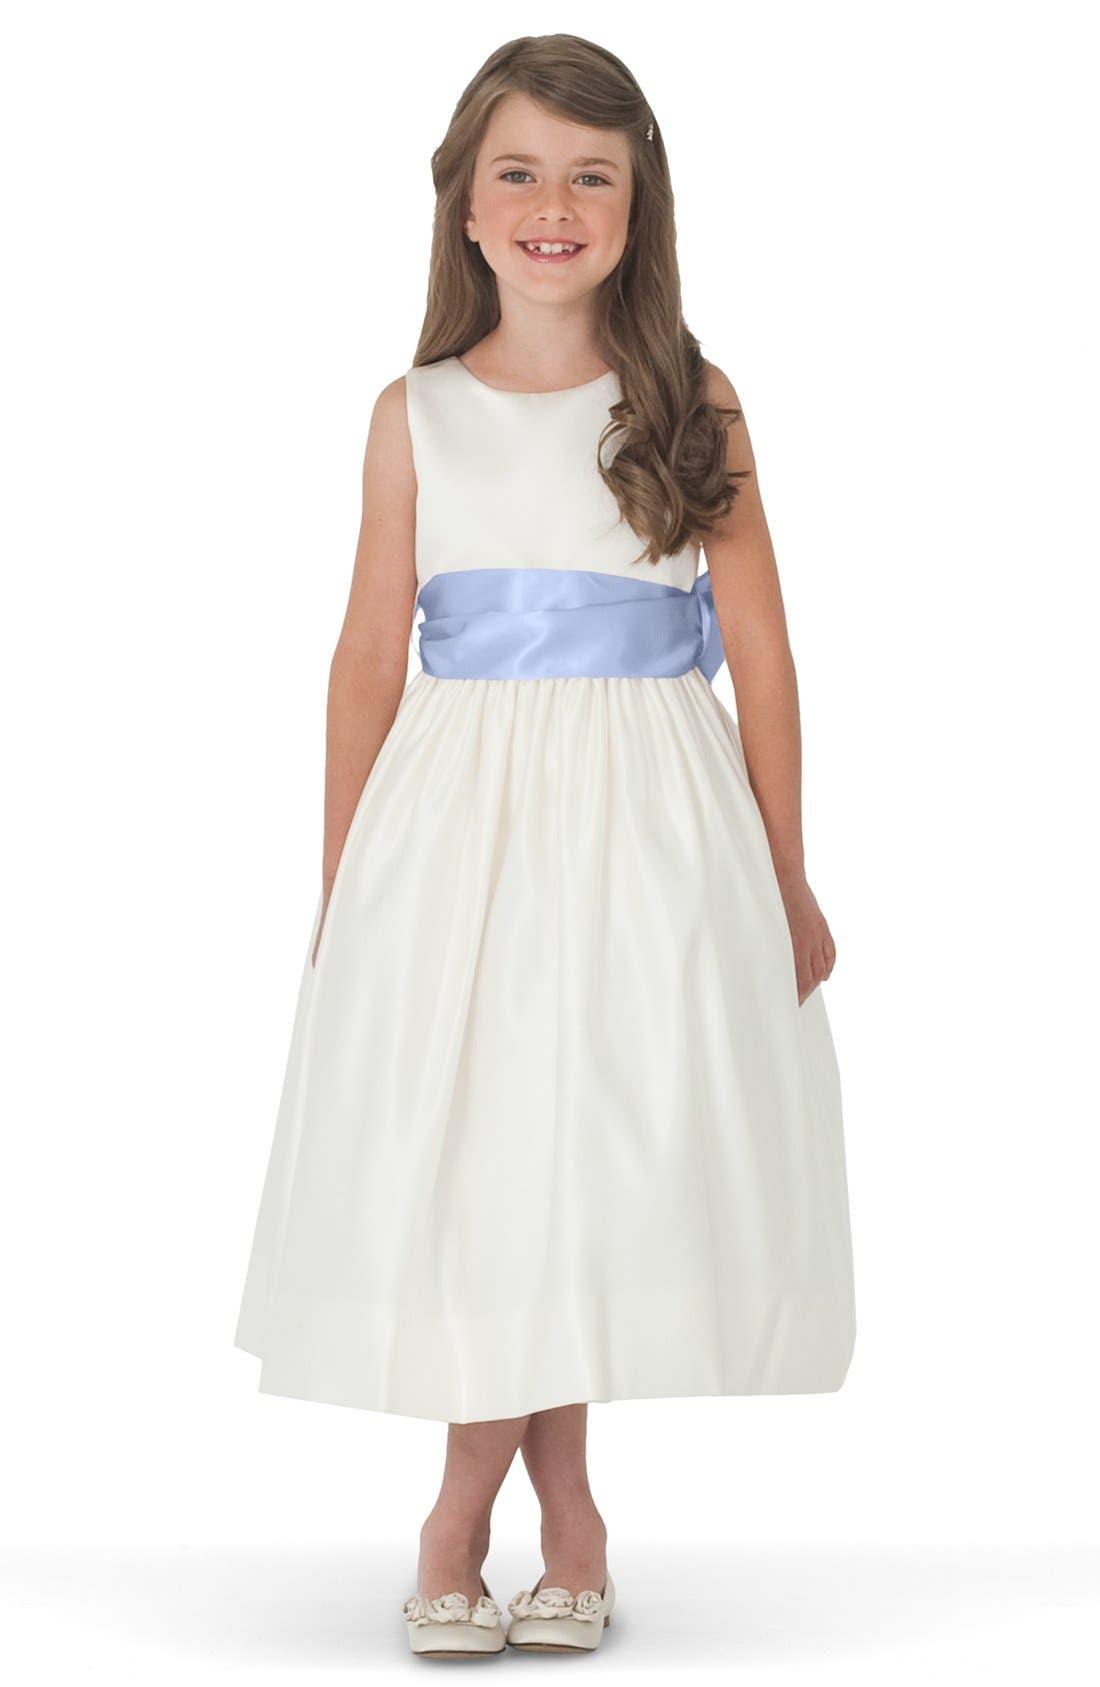 Us Angels Sleeveless Satin Dress with Contrast Sash (Toddler Girls, Little Girls & Big Girls)